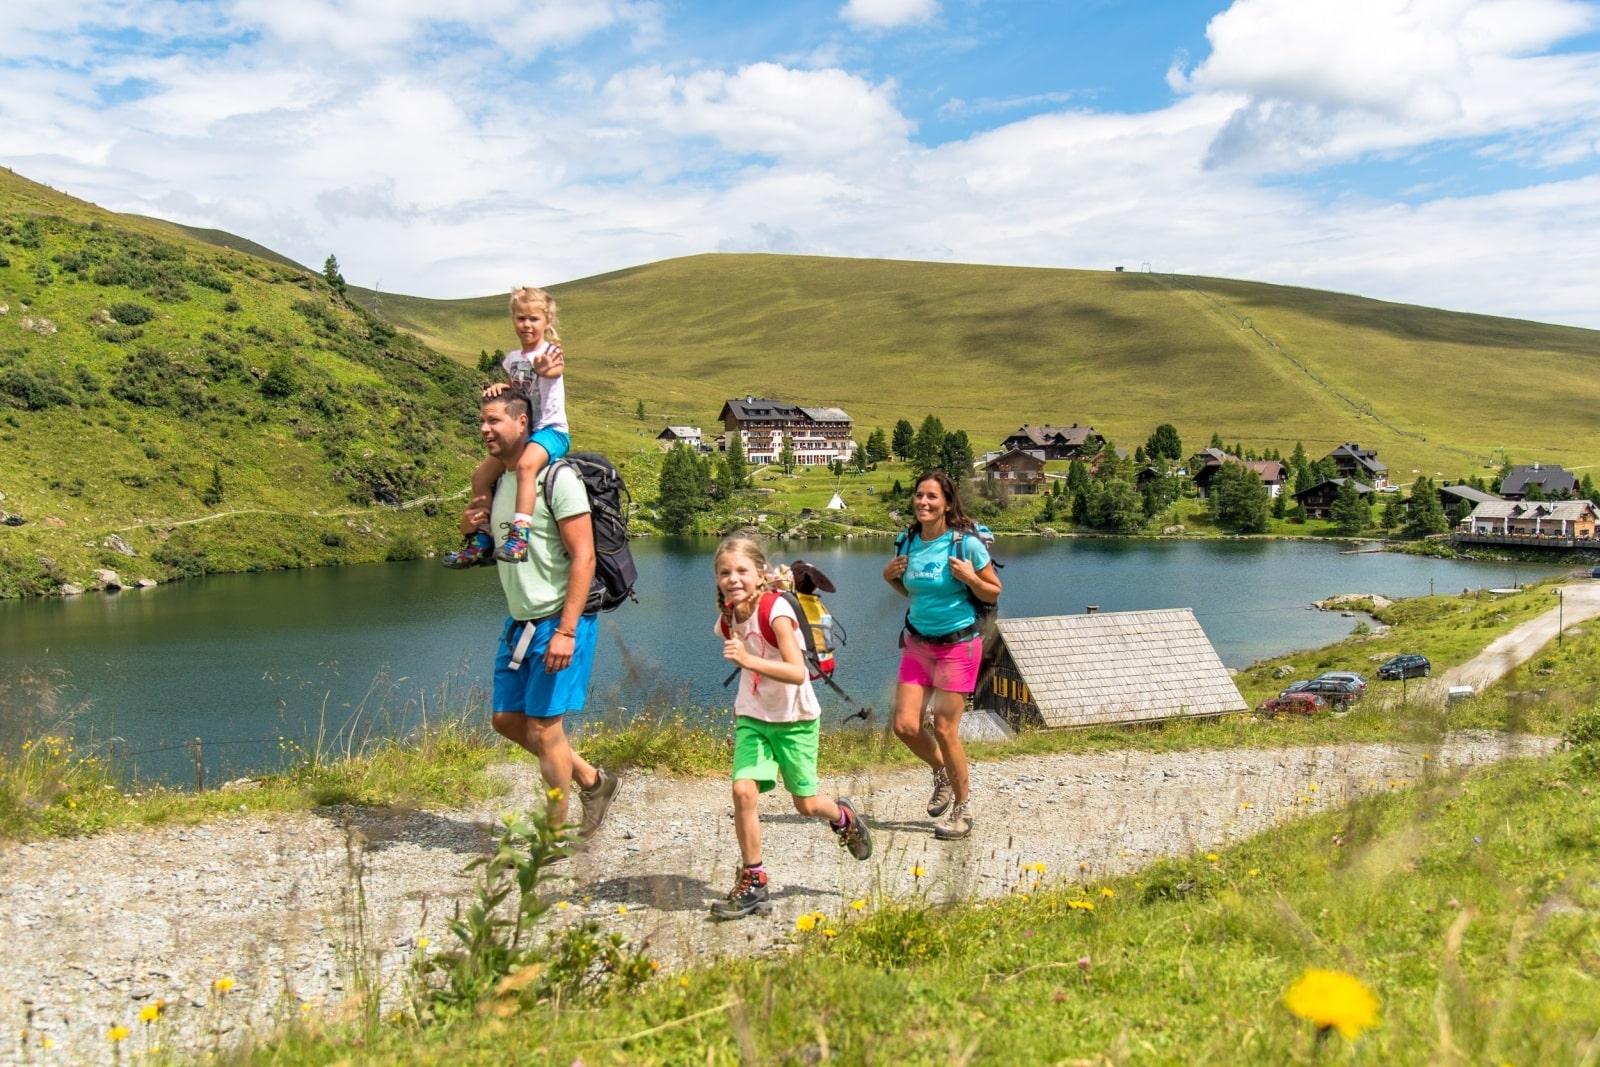 Heidi-Chalet-Falkert-Heidialm-Falkertsee-Natur-Wandern-Kinder